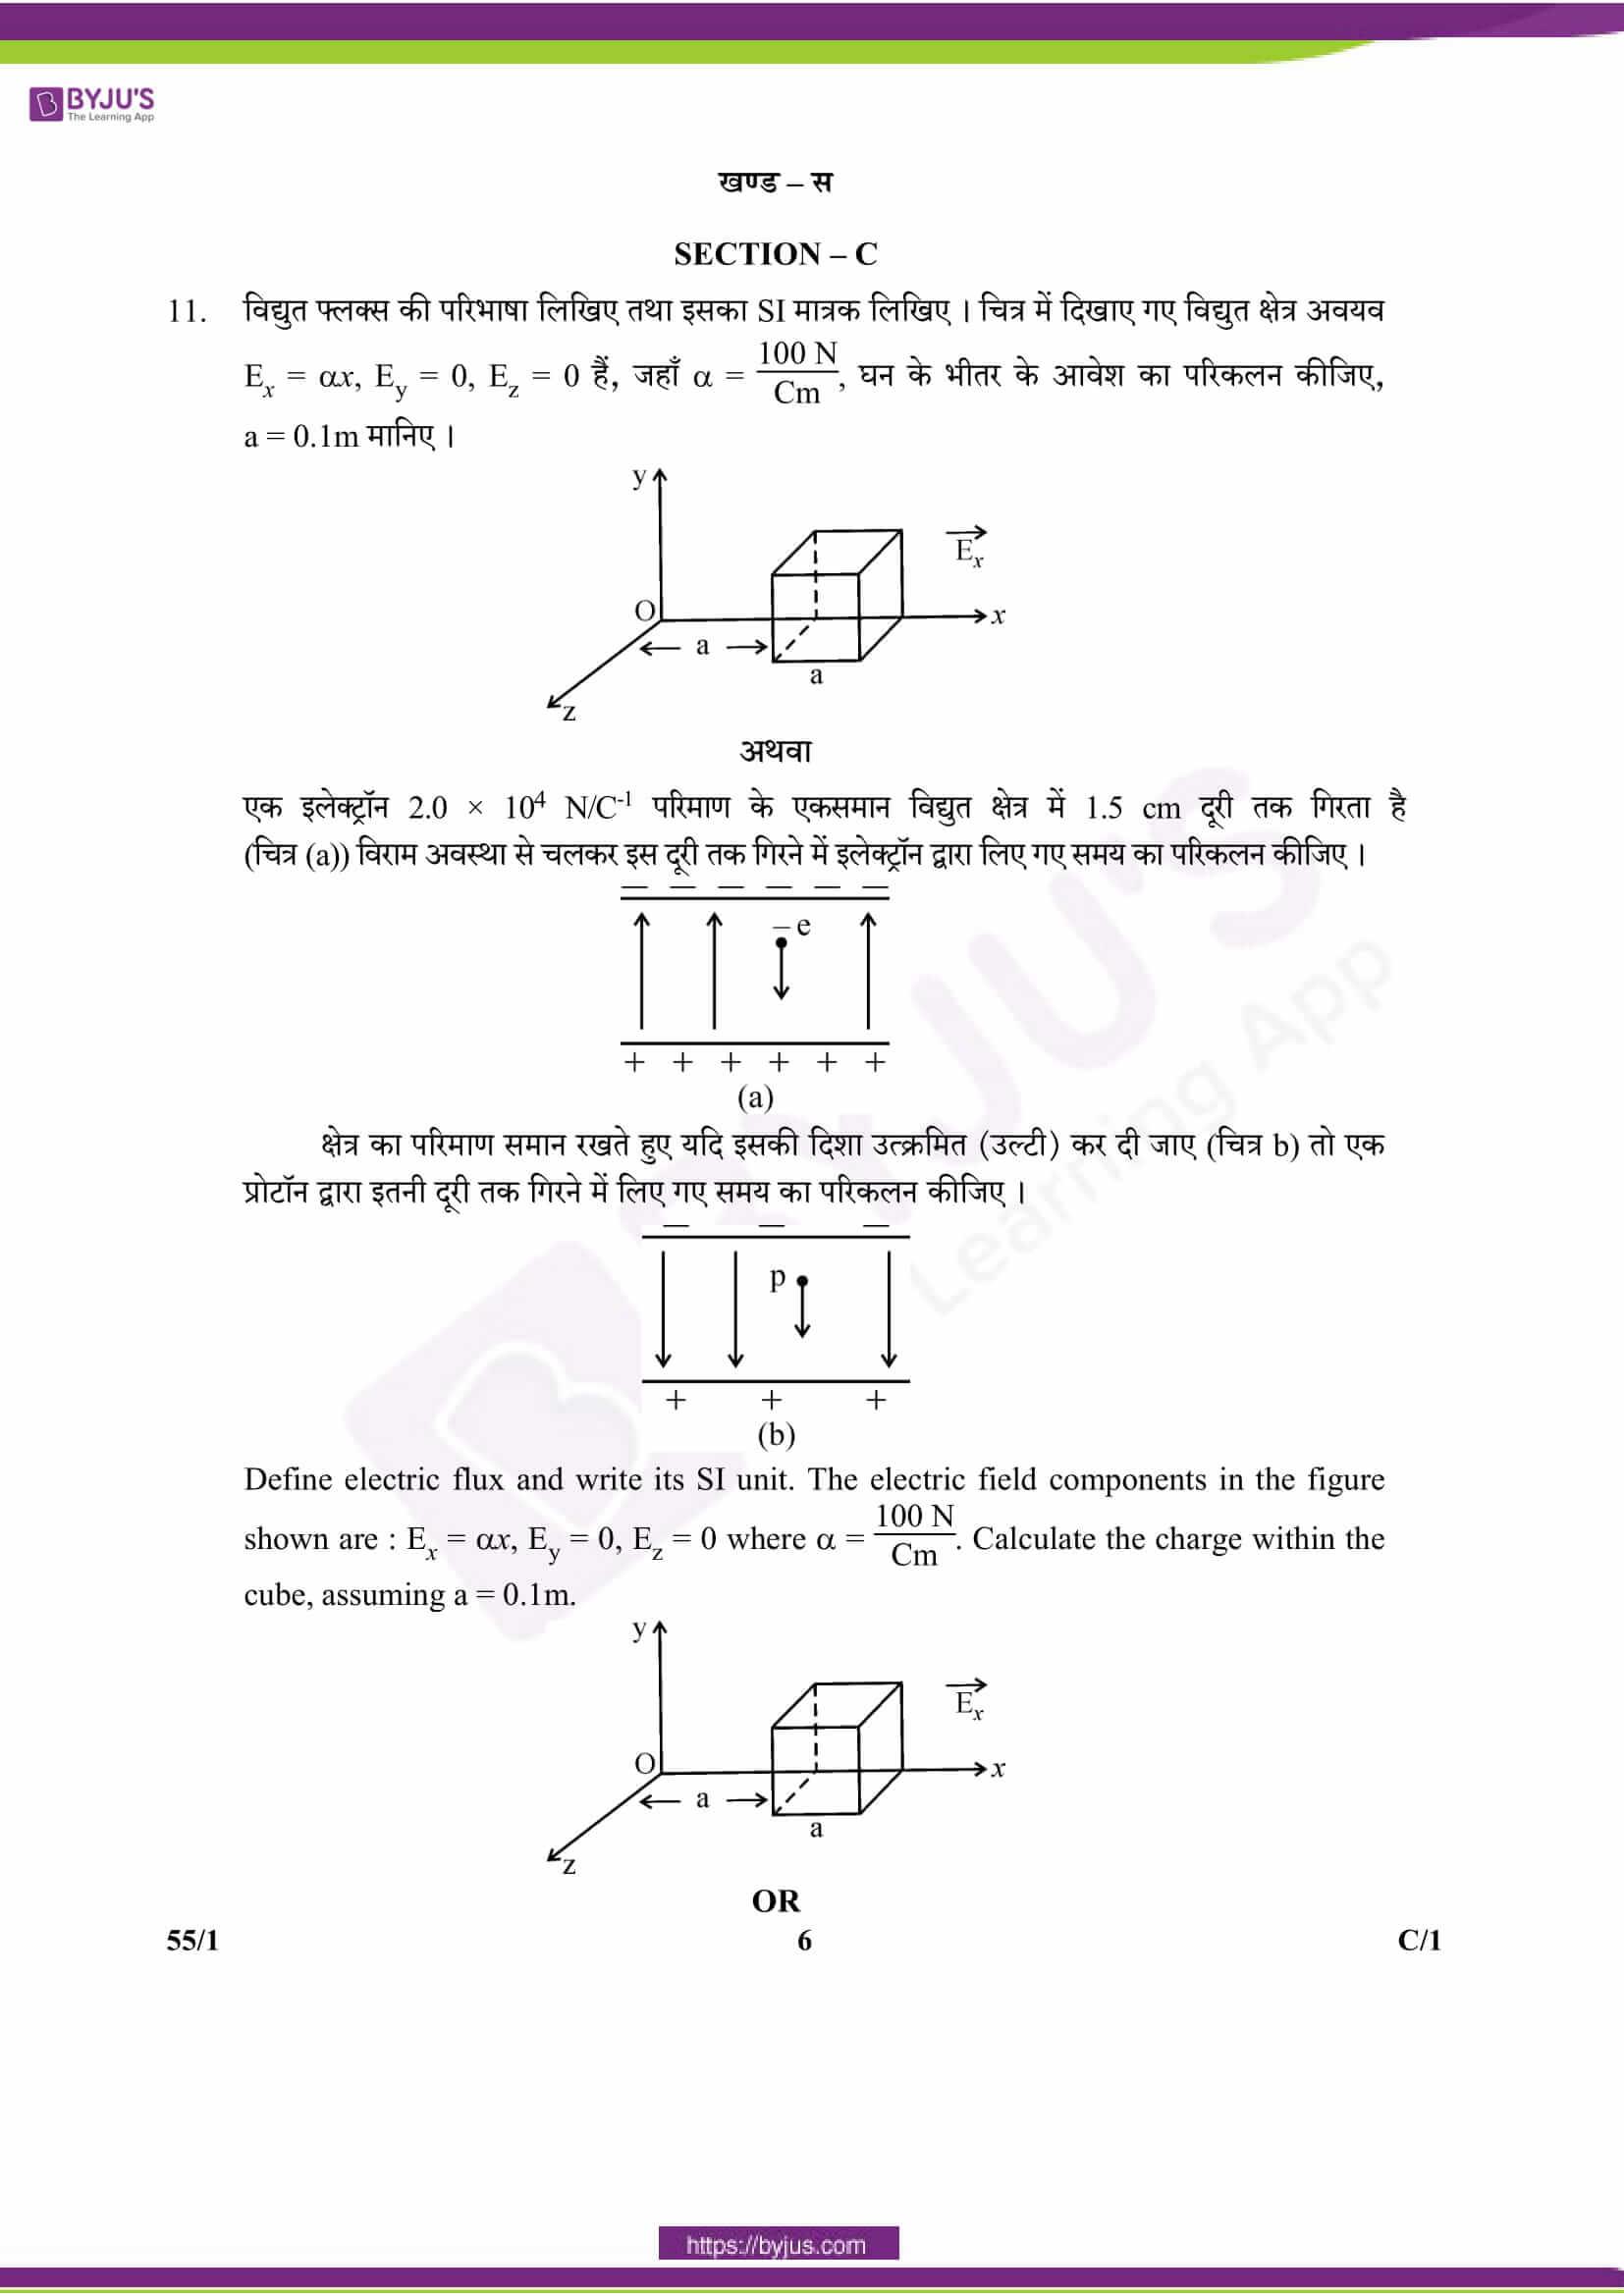 cbse class 12 phy 2018 question paper set 1